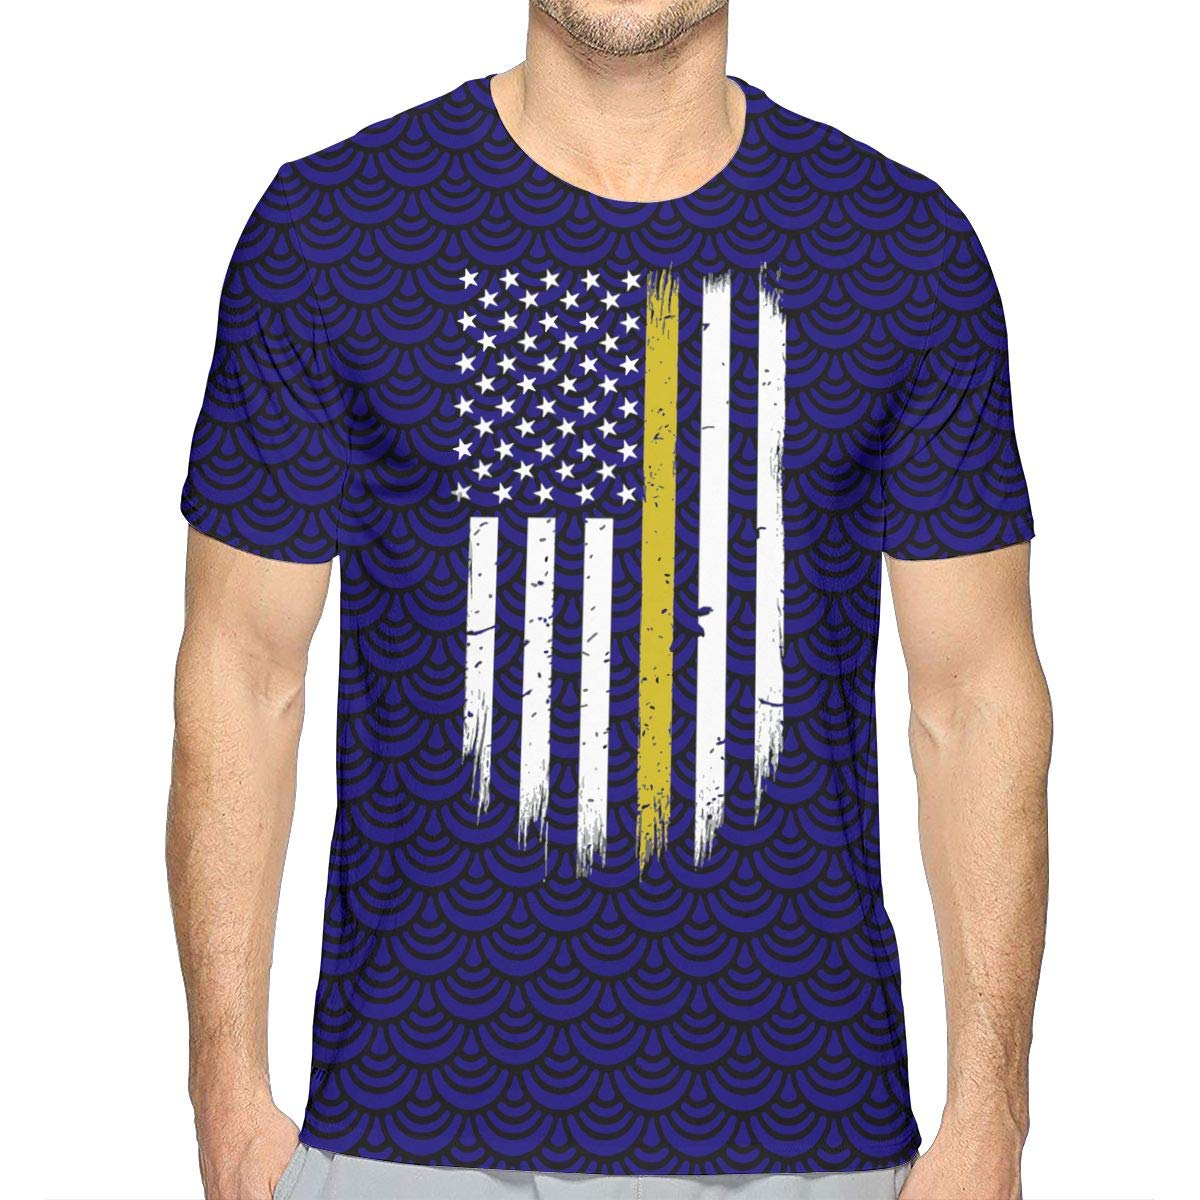 JJKKFG-H 911 Dispatcher Thin Gold Line Mens Cool Short Sleeve Tshirt